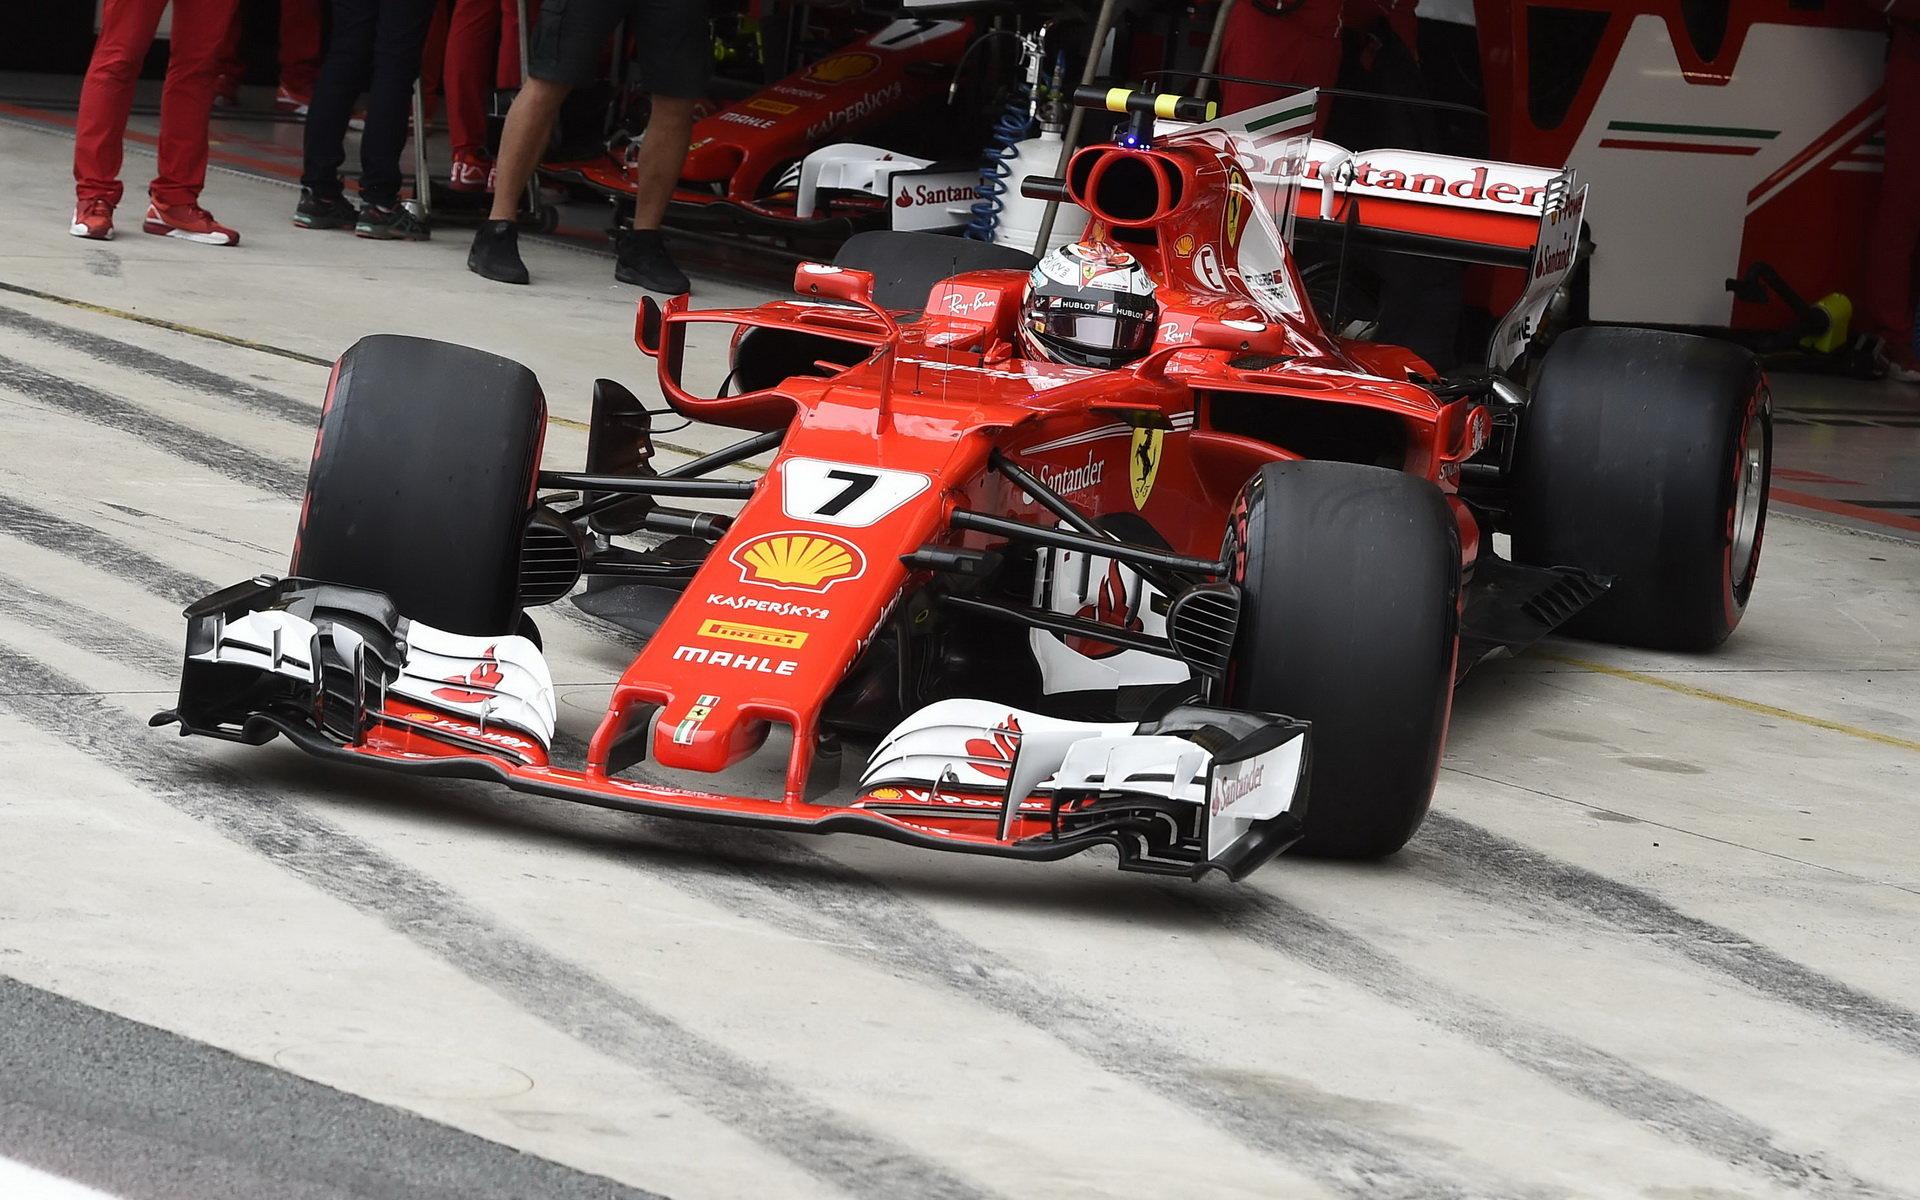 Kimi Räikkönen za svým týmovým kolegou zaostává o 109 bodů